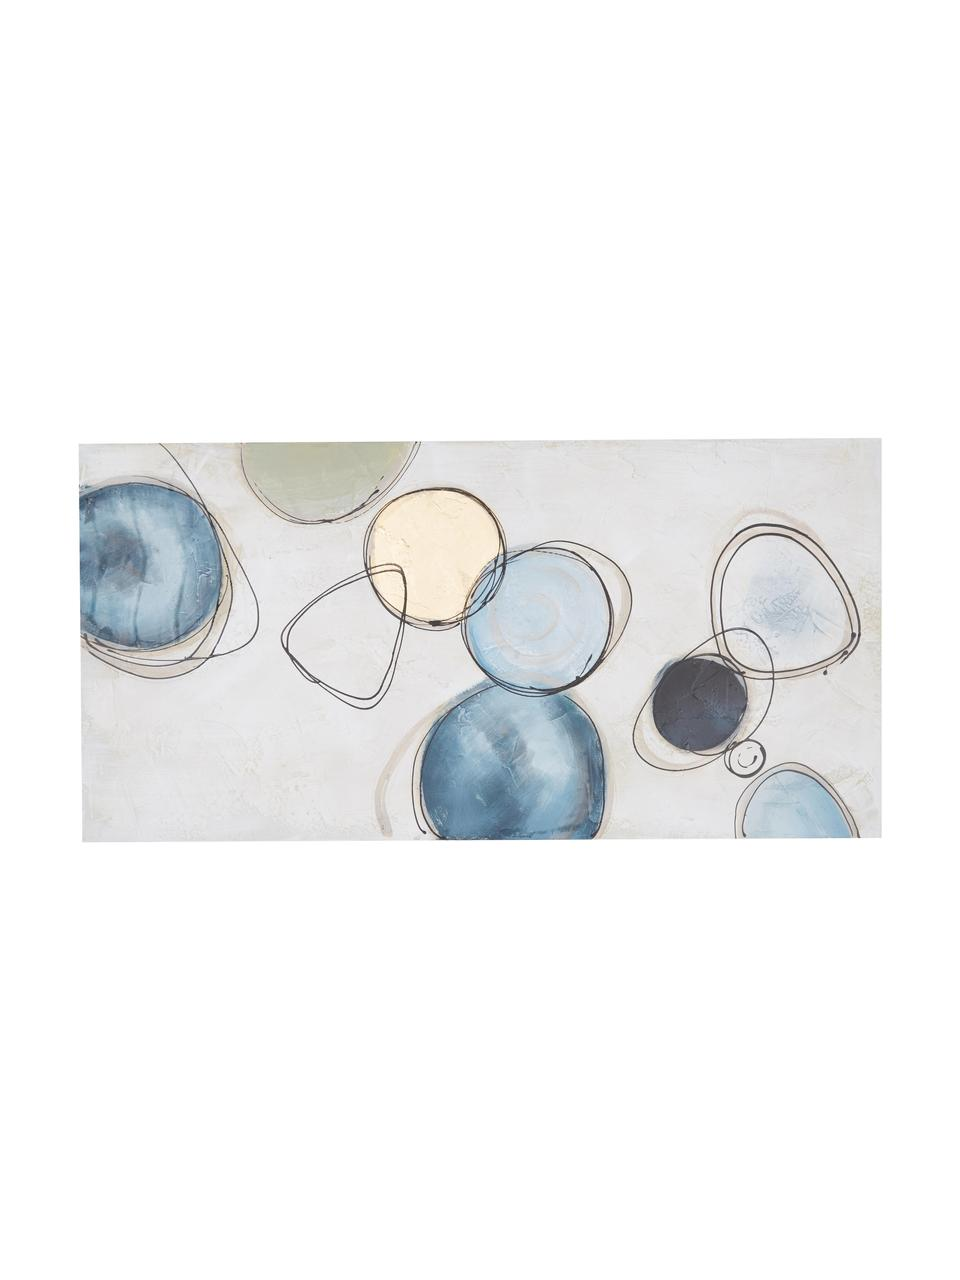 Handgeschilderde canvasdoek Convenience, Afbeelding: olieverf op linnen (300 g, Multicolour, 140 x 70 cm